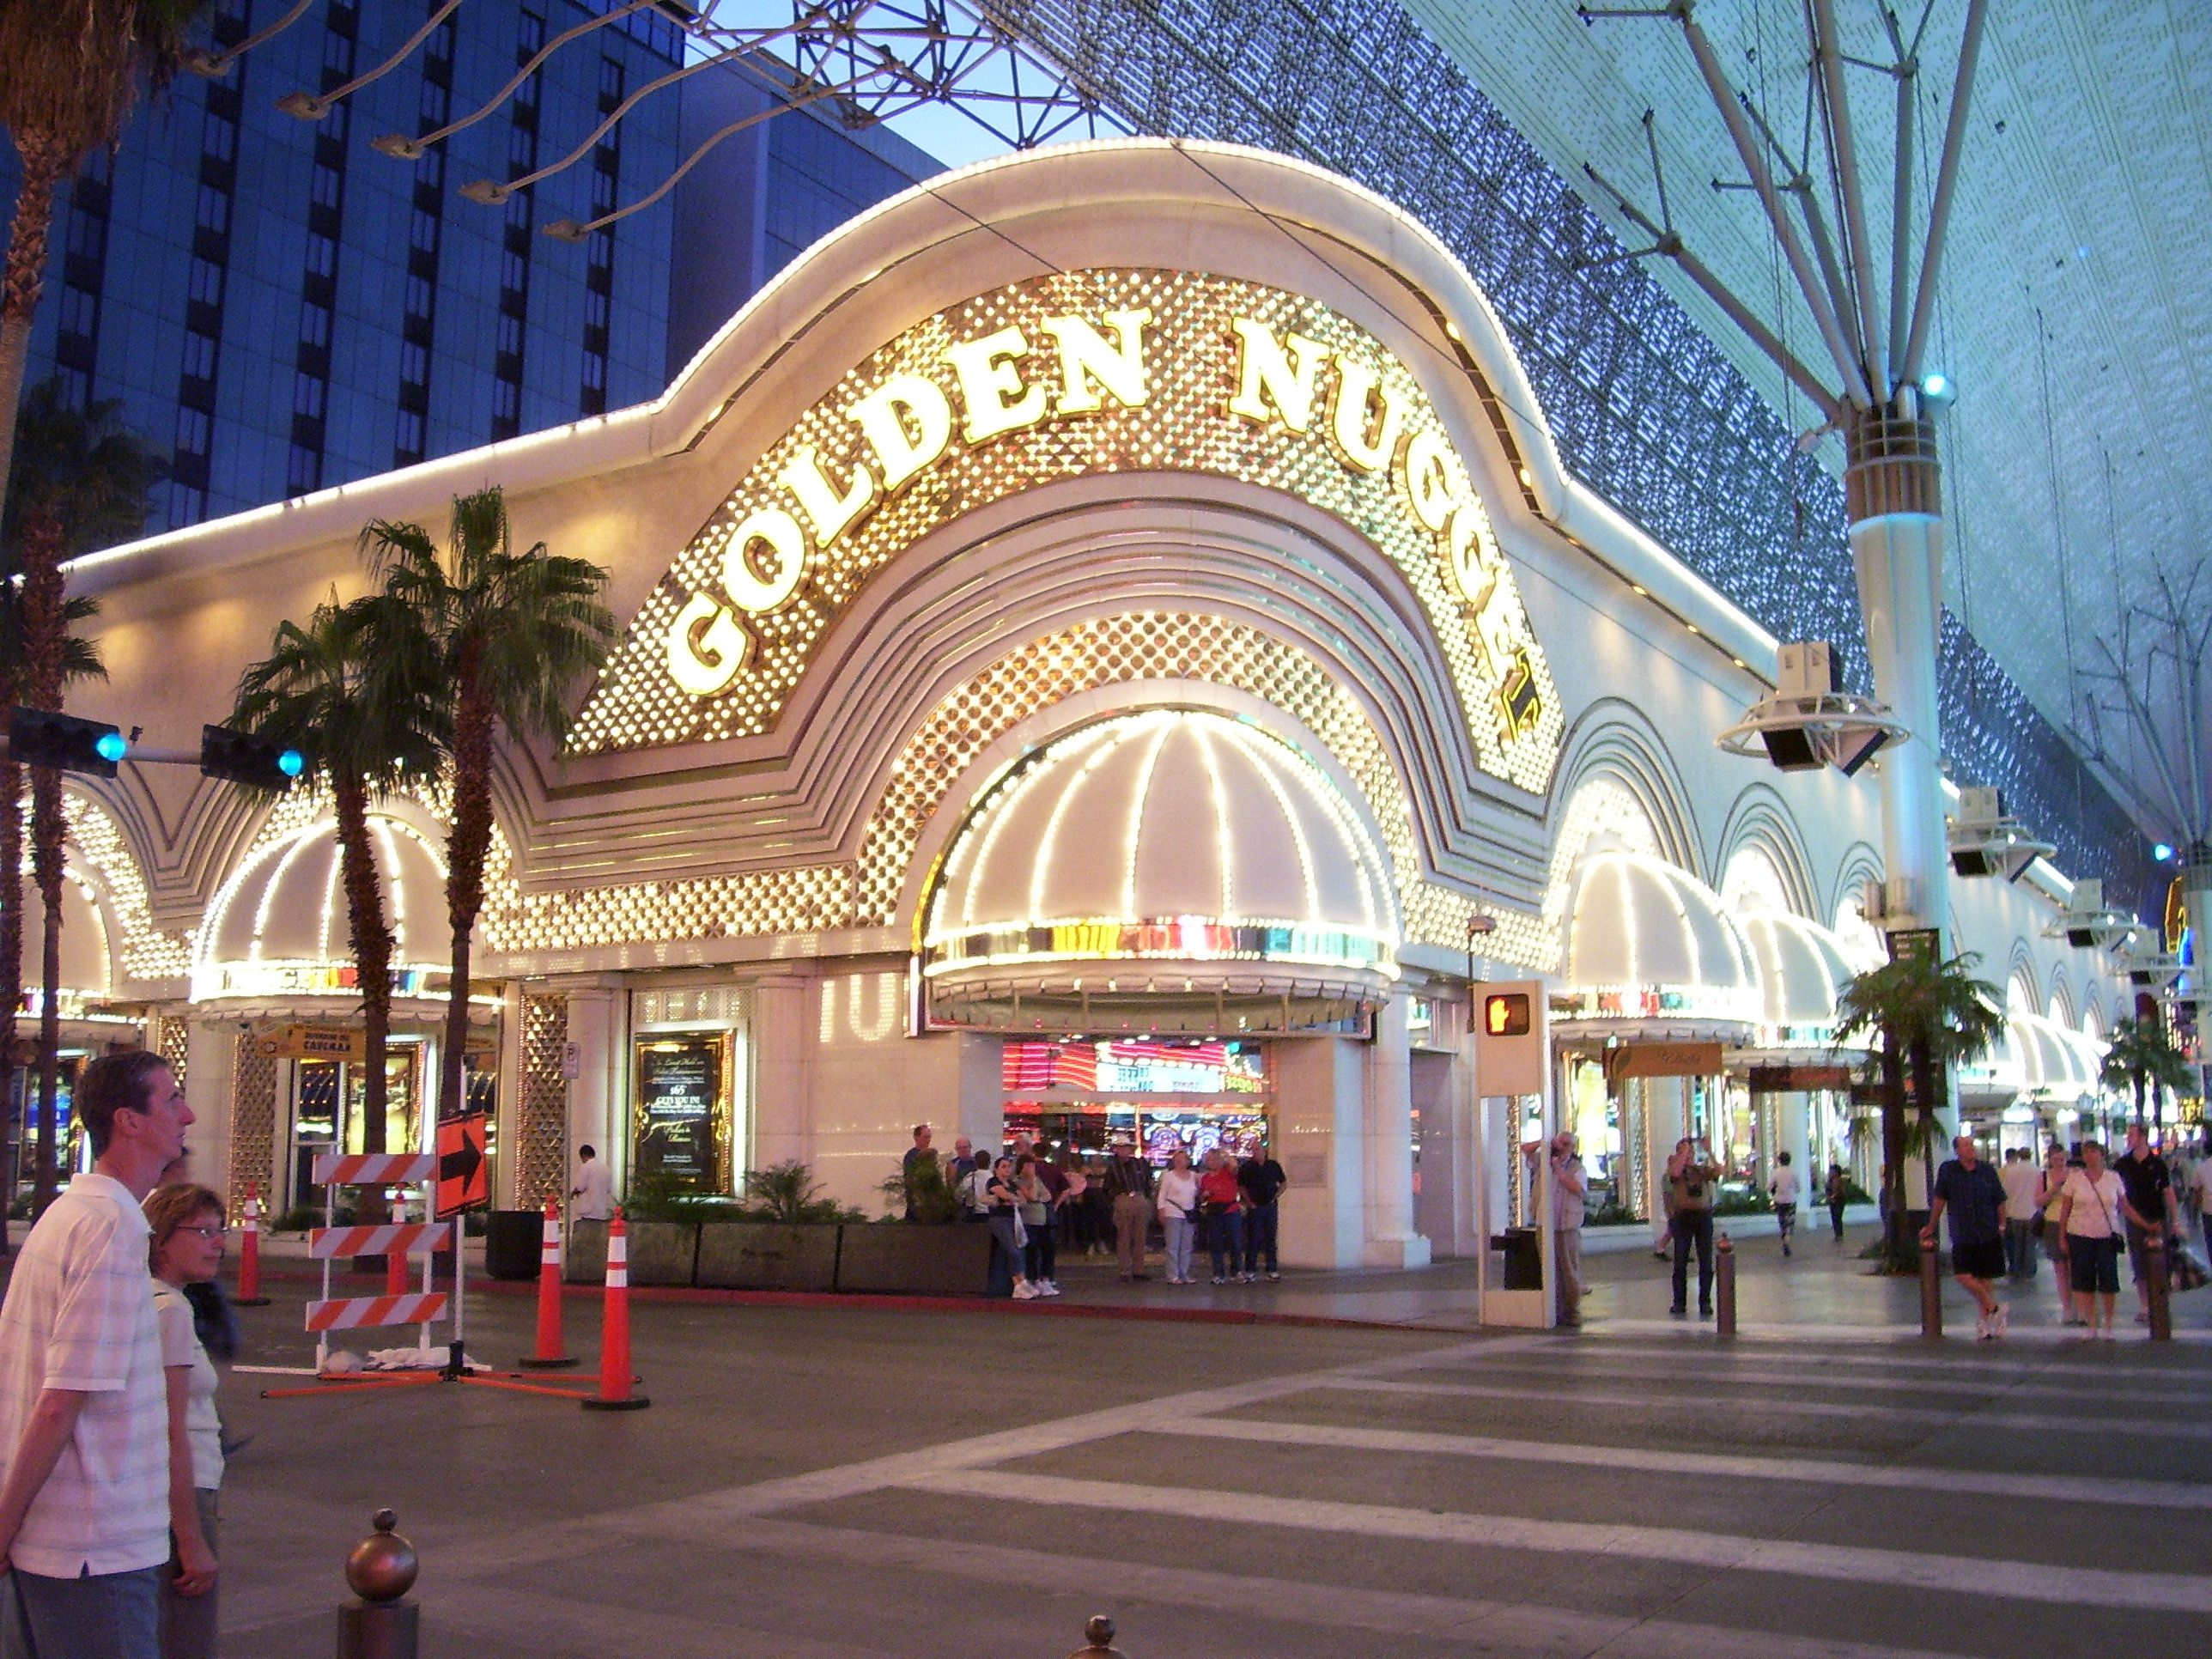 Golden Nugget Hotel And Casino Freemont Street Las Vegas Nevada